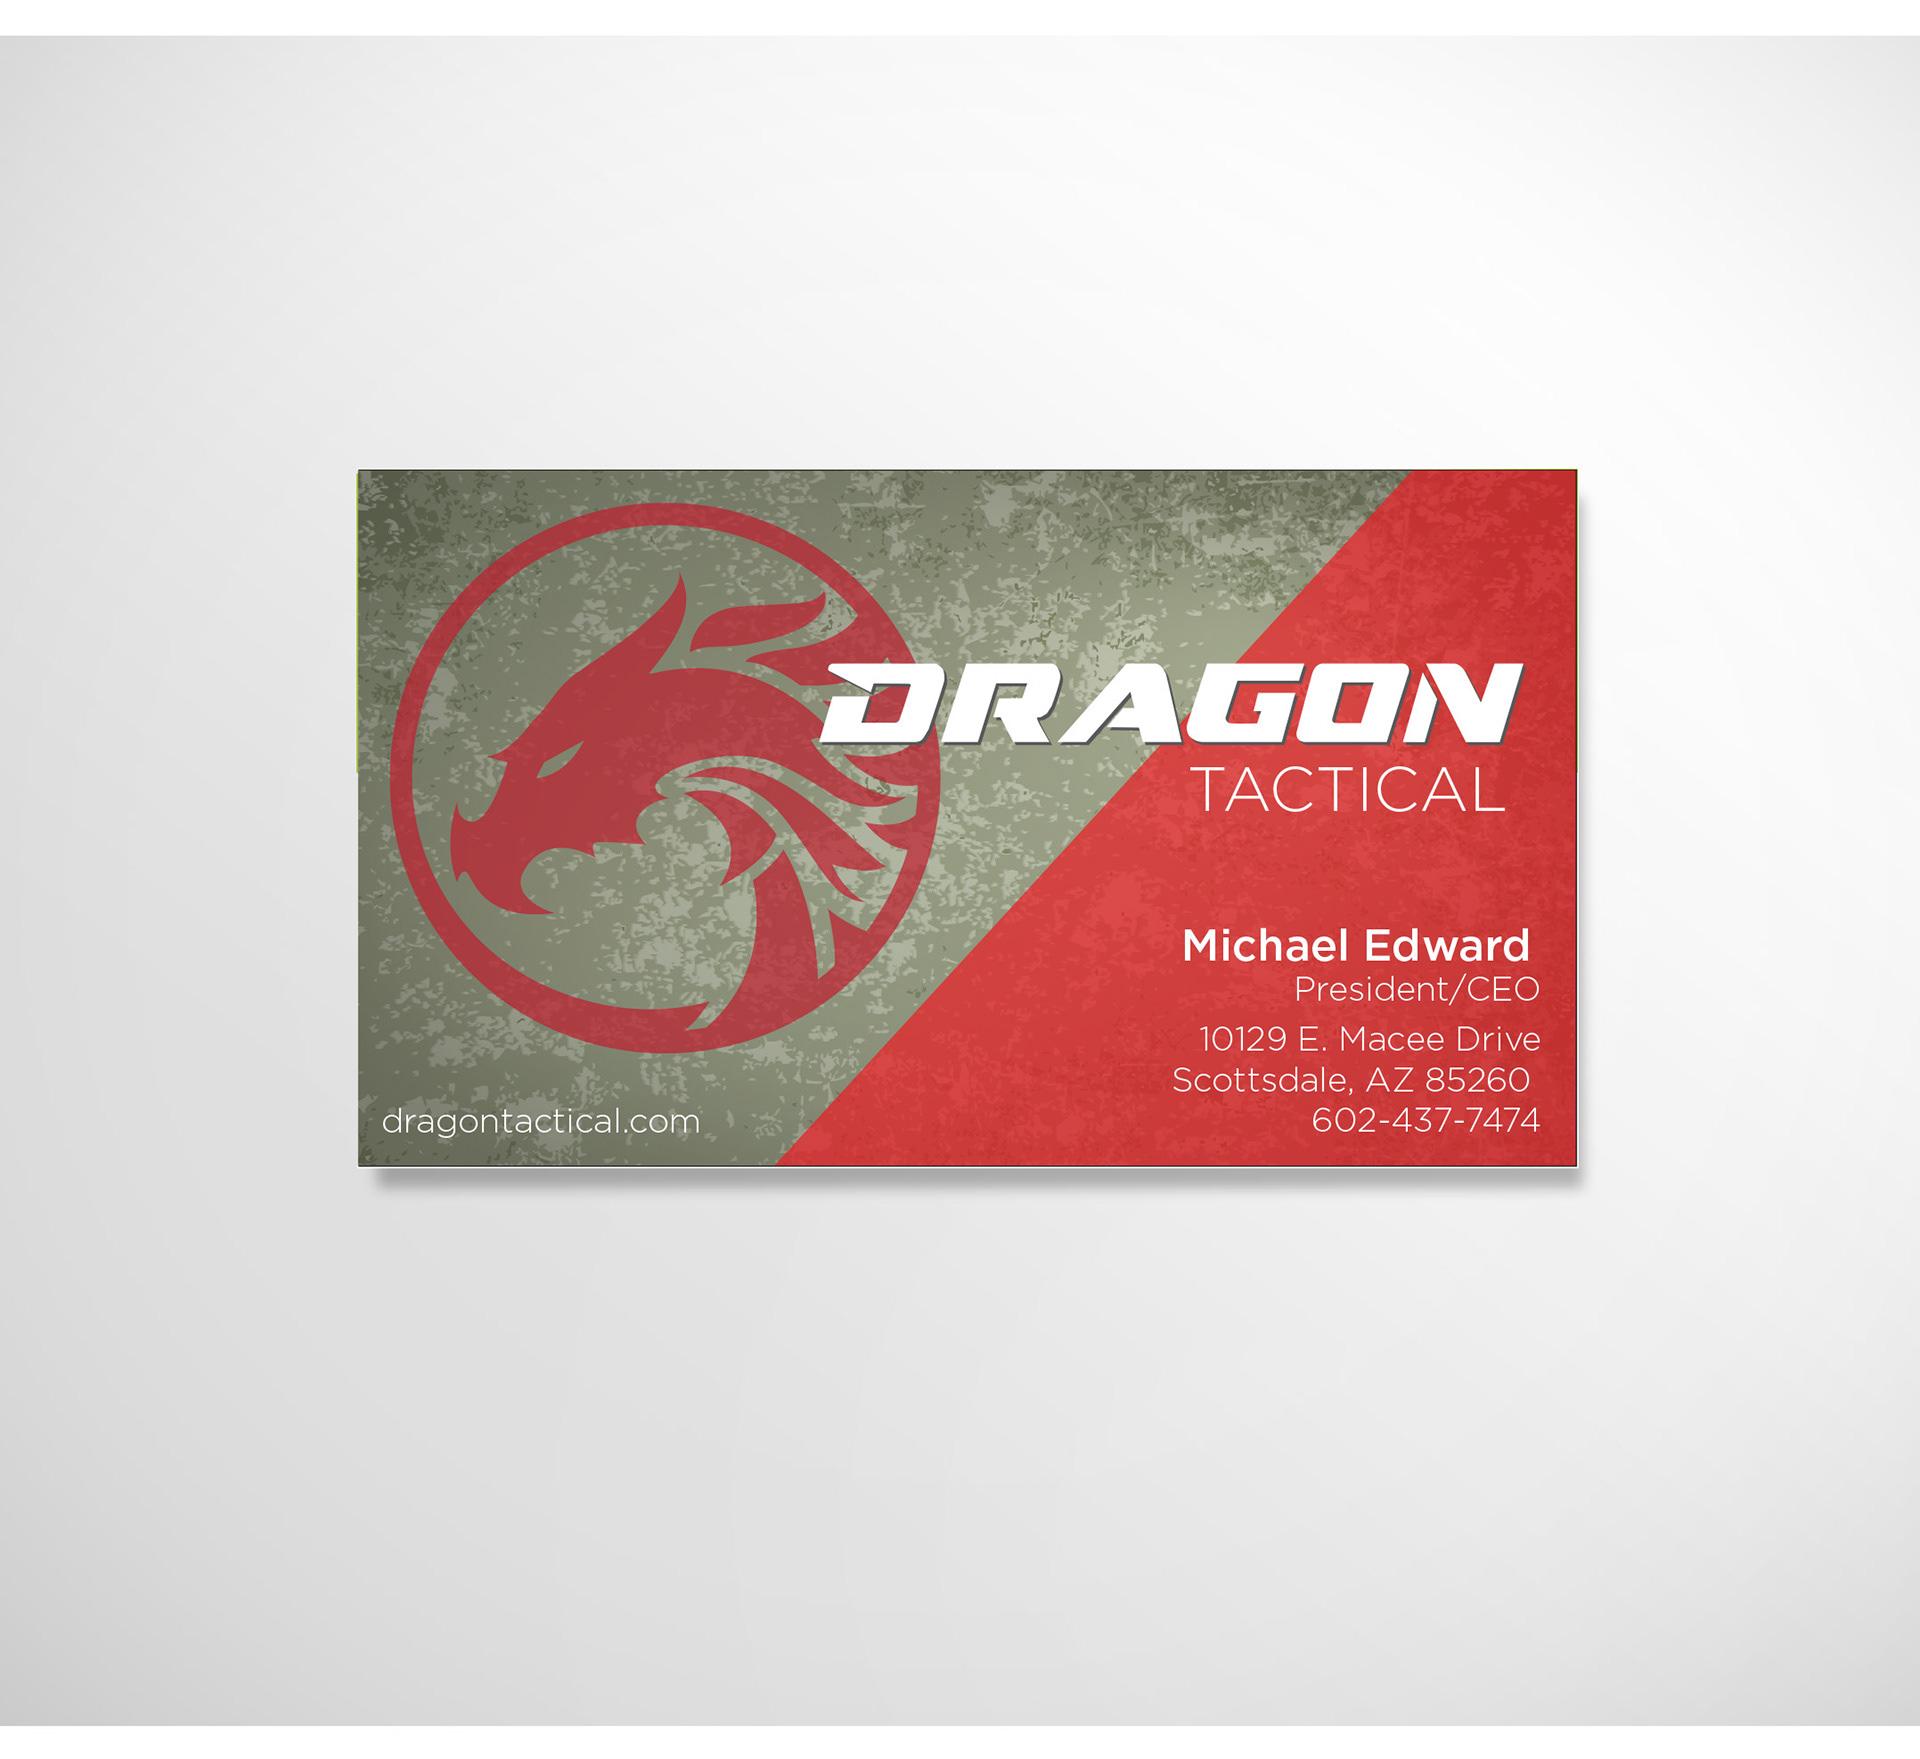 Jeff Loserth Design Business Card And Logo Design